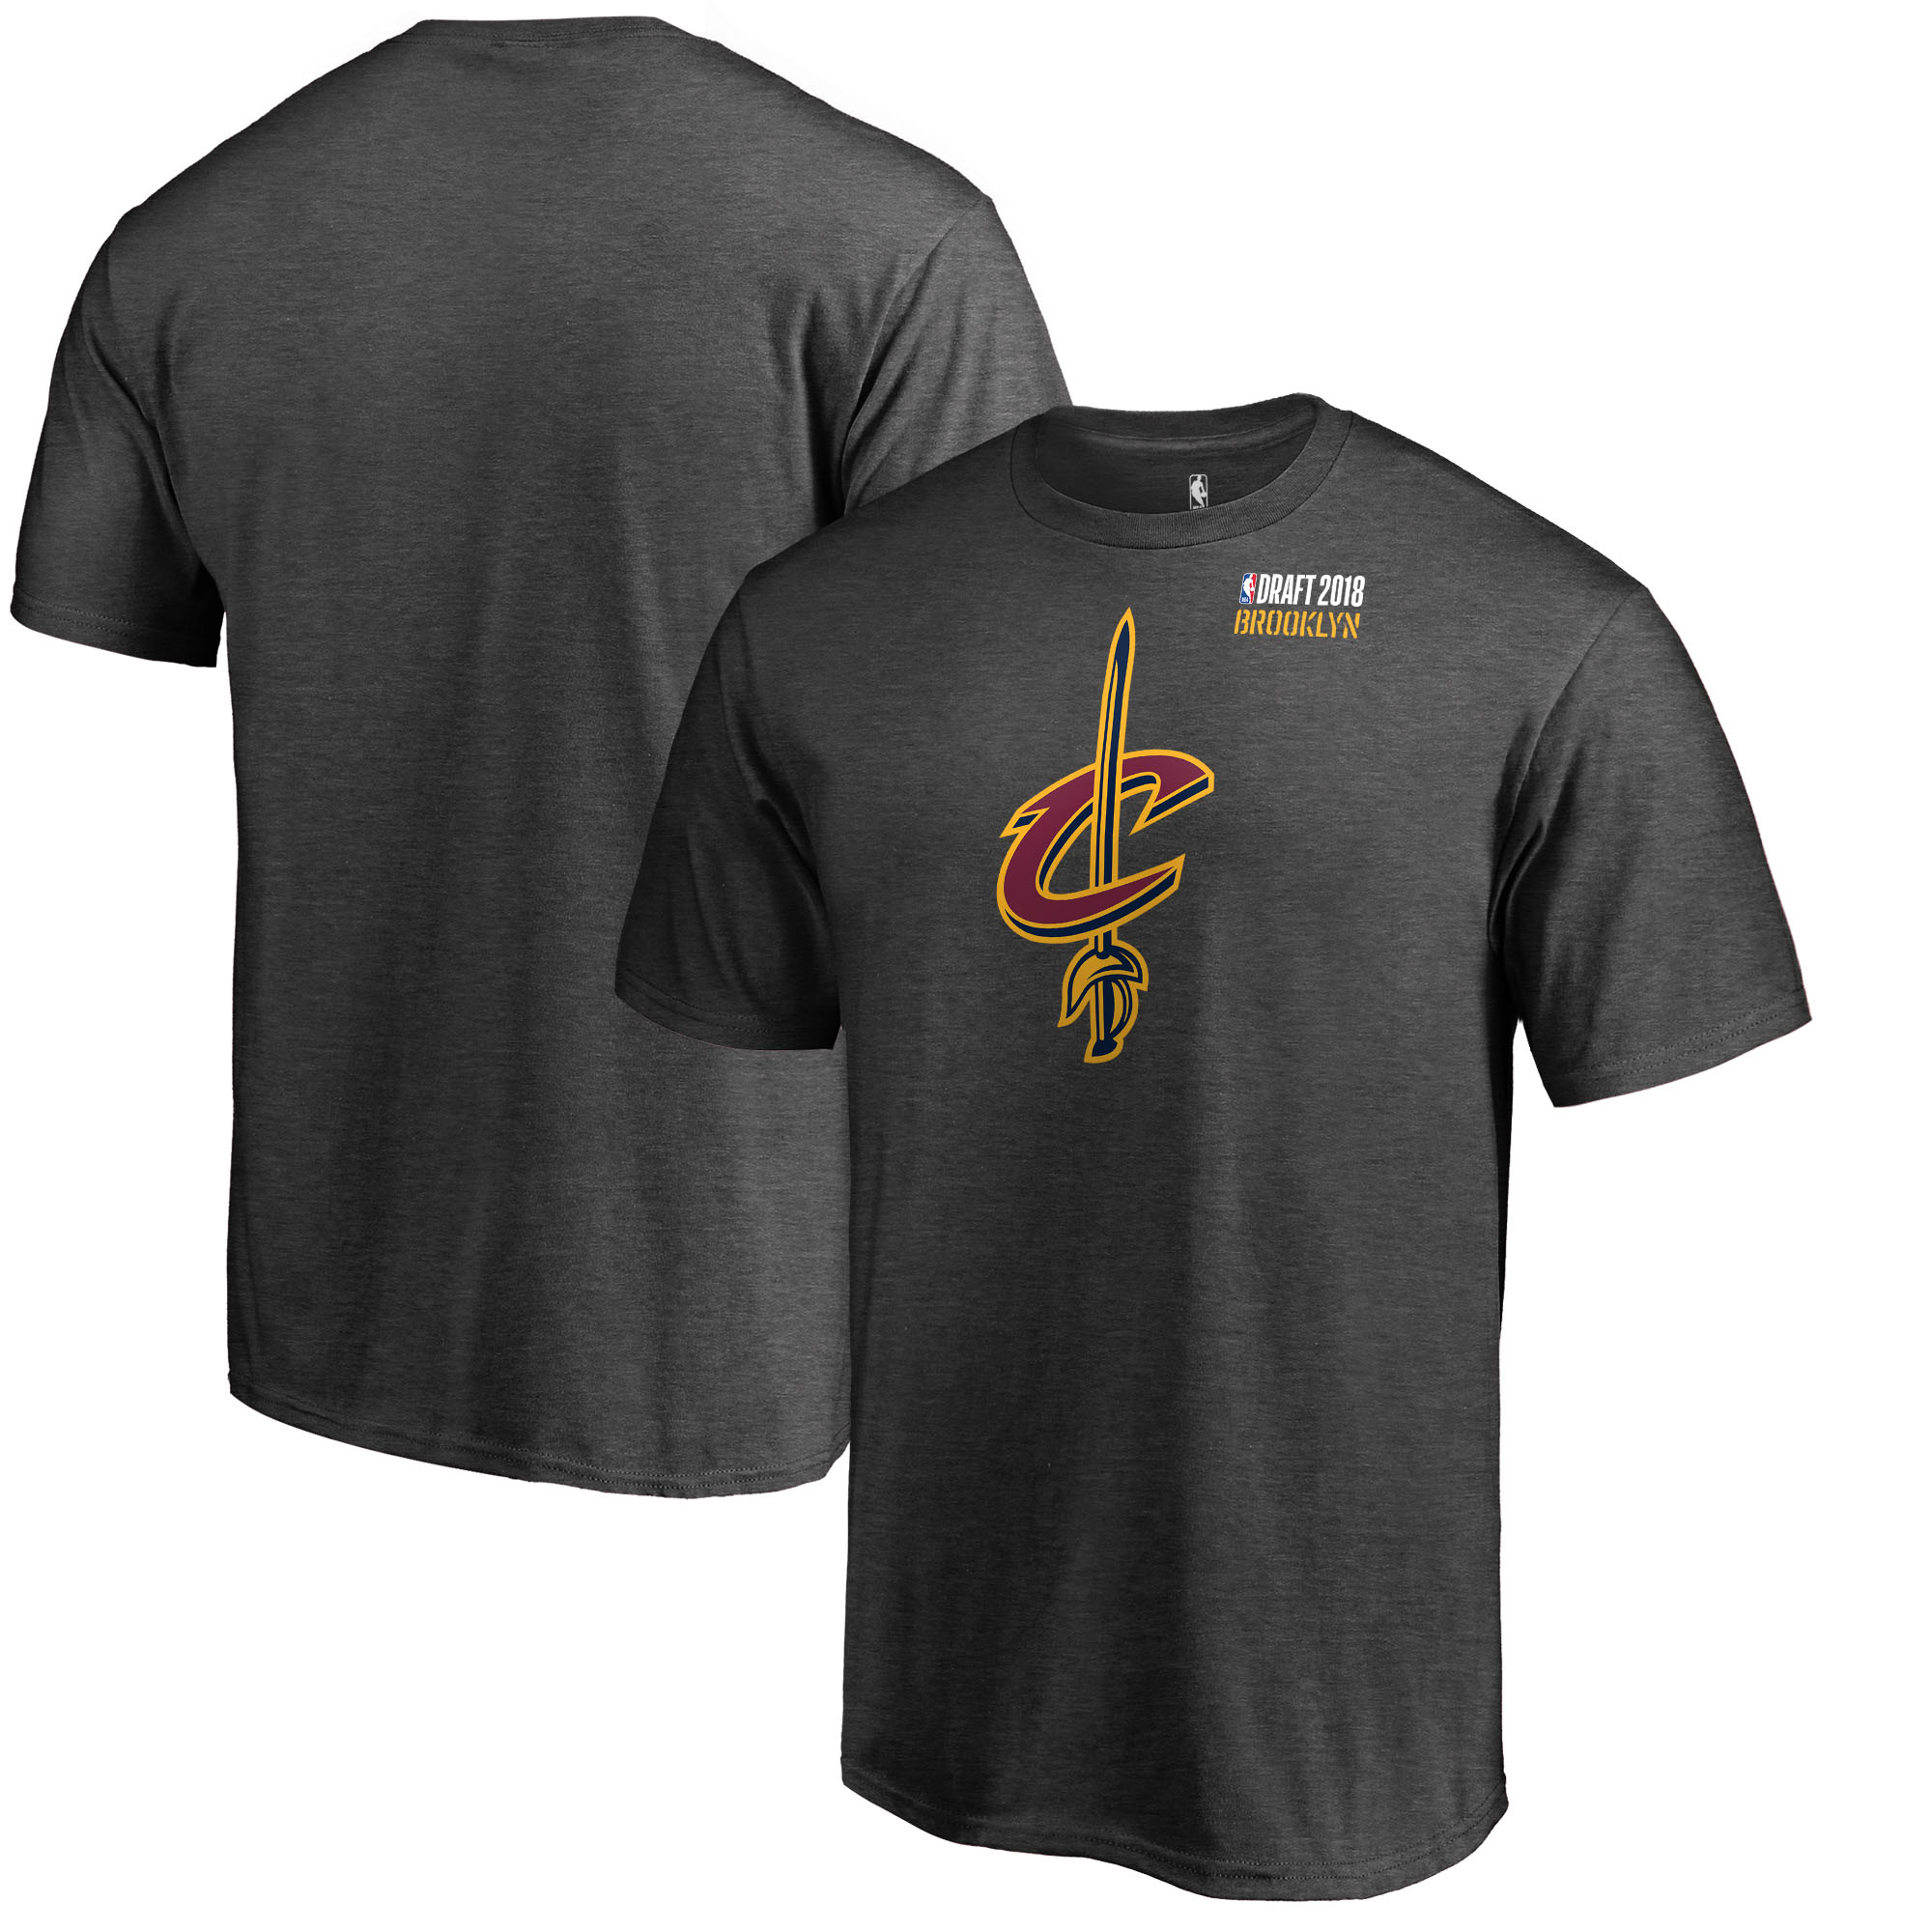 Cleveland Cavaliers Fanatics Branded 2018 NBA Draft BKLYN T-Shirt - Heather Gray